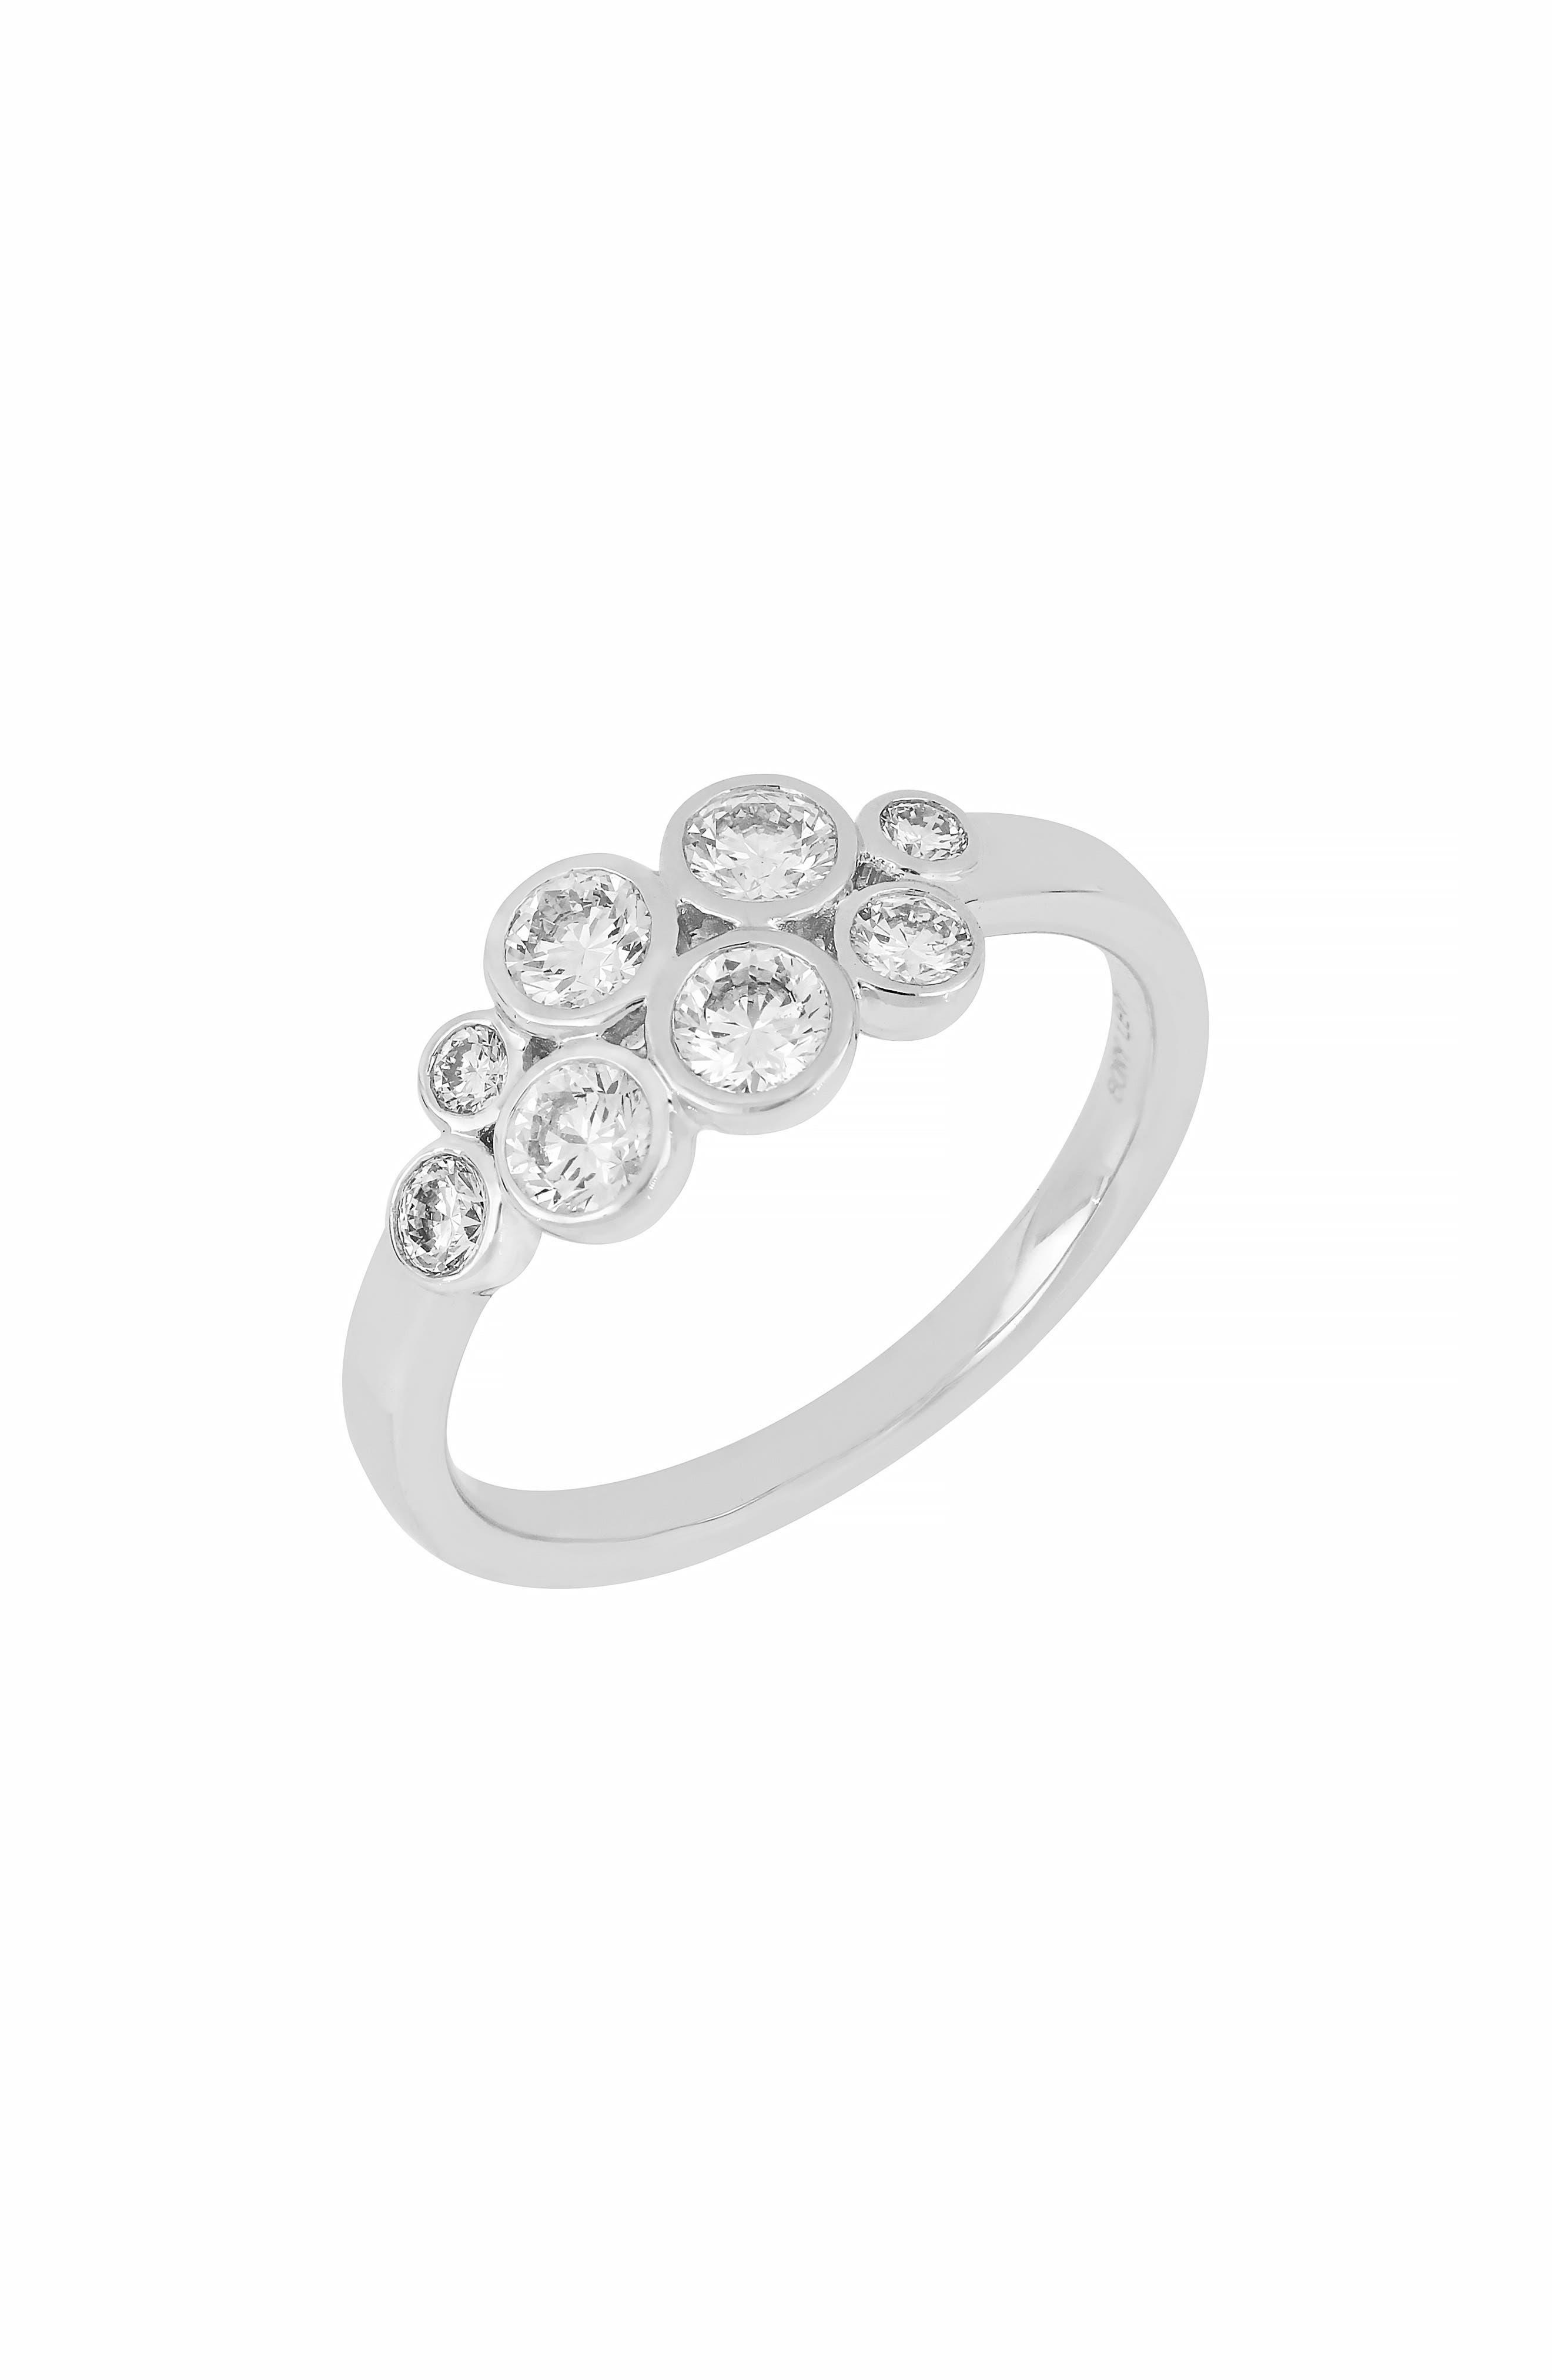 Bubble Diamond Ring,                         Main,                         color, WHITE GOLD/ DIAMOND